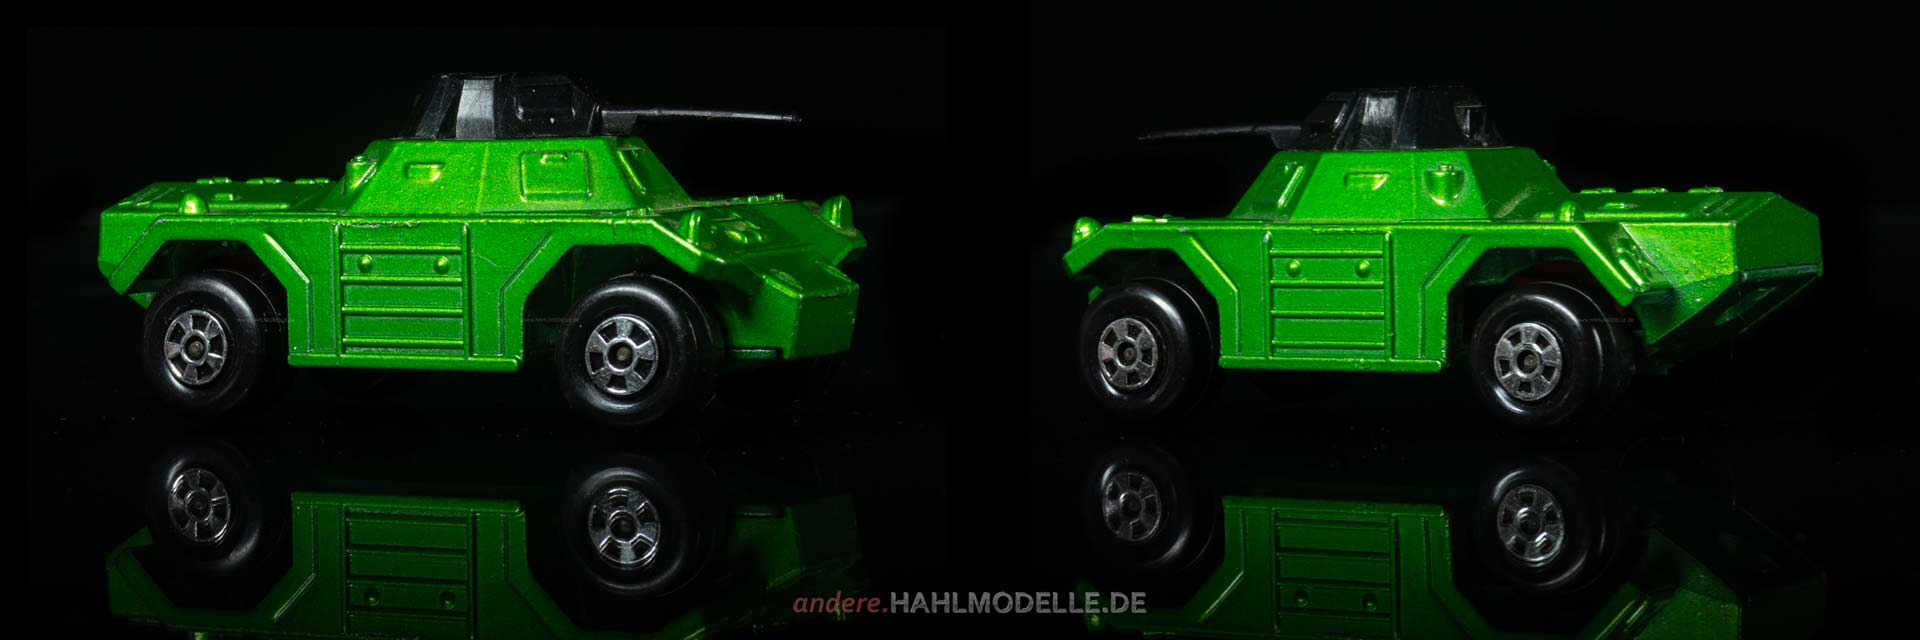 """Weasel"" | Panzer | Lesney Products & Co. Ltd. | Matchbox Rolamatics | 1:52 | www.andere.hahlmodelle.de"